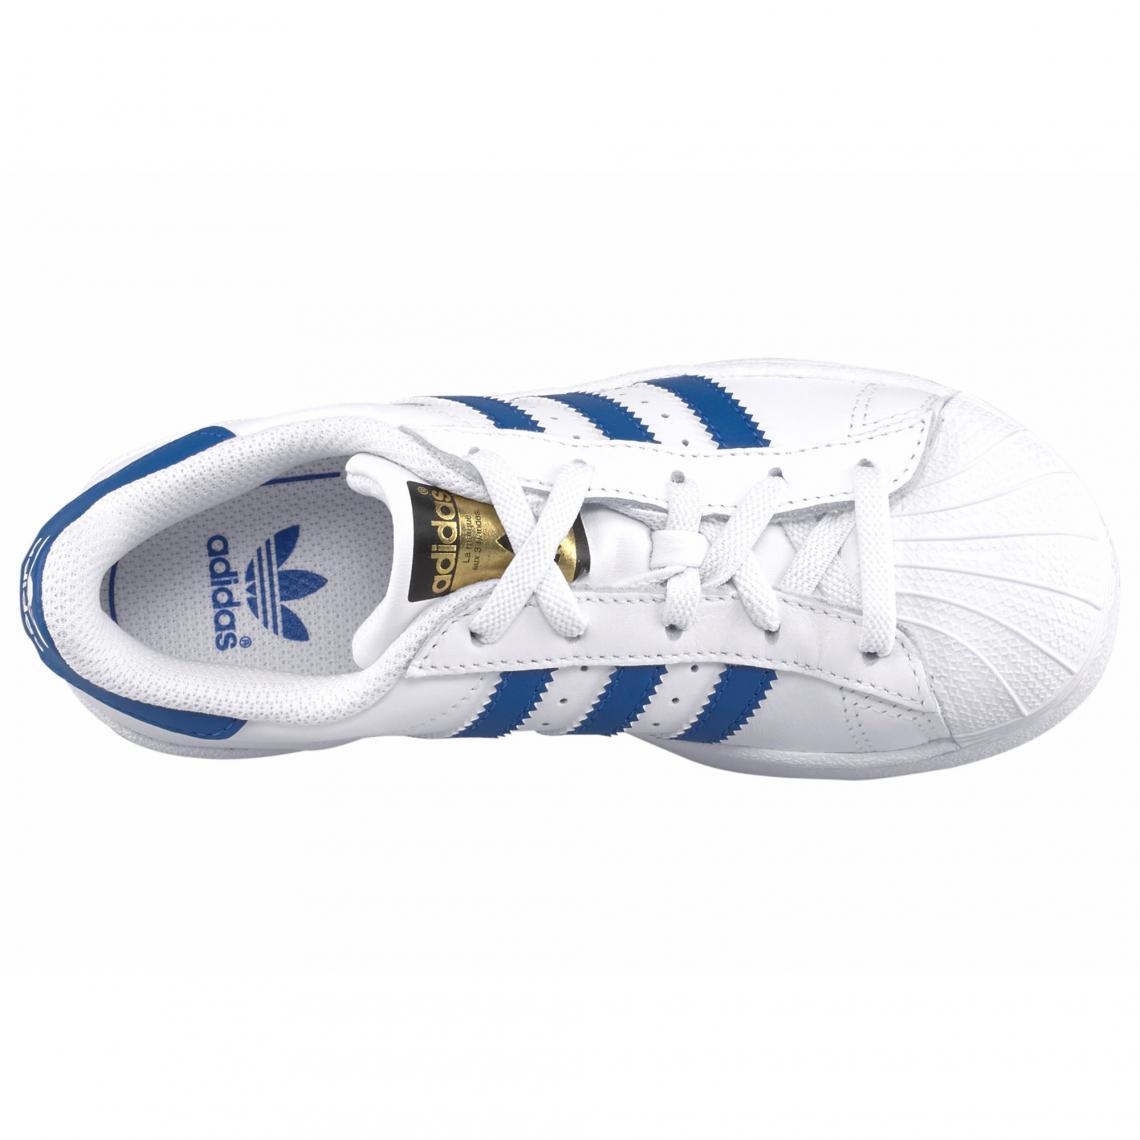 Baskets enfant adidas Originals Superstar